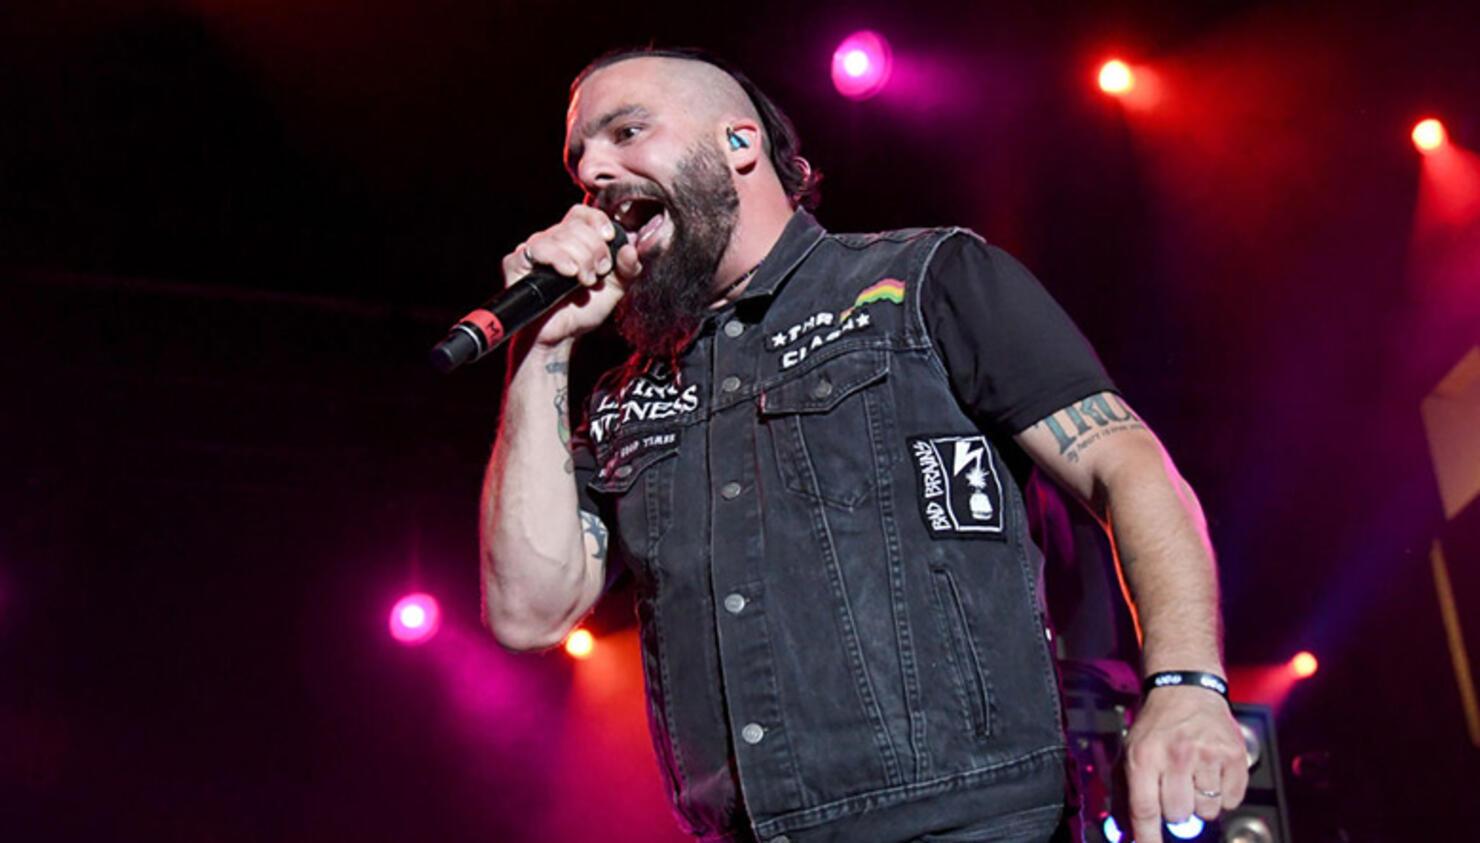 Killswitch Engage Frontman Jesse Leach Needs Throat Surgery